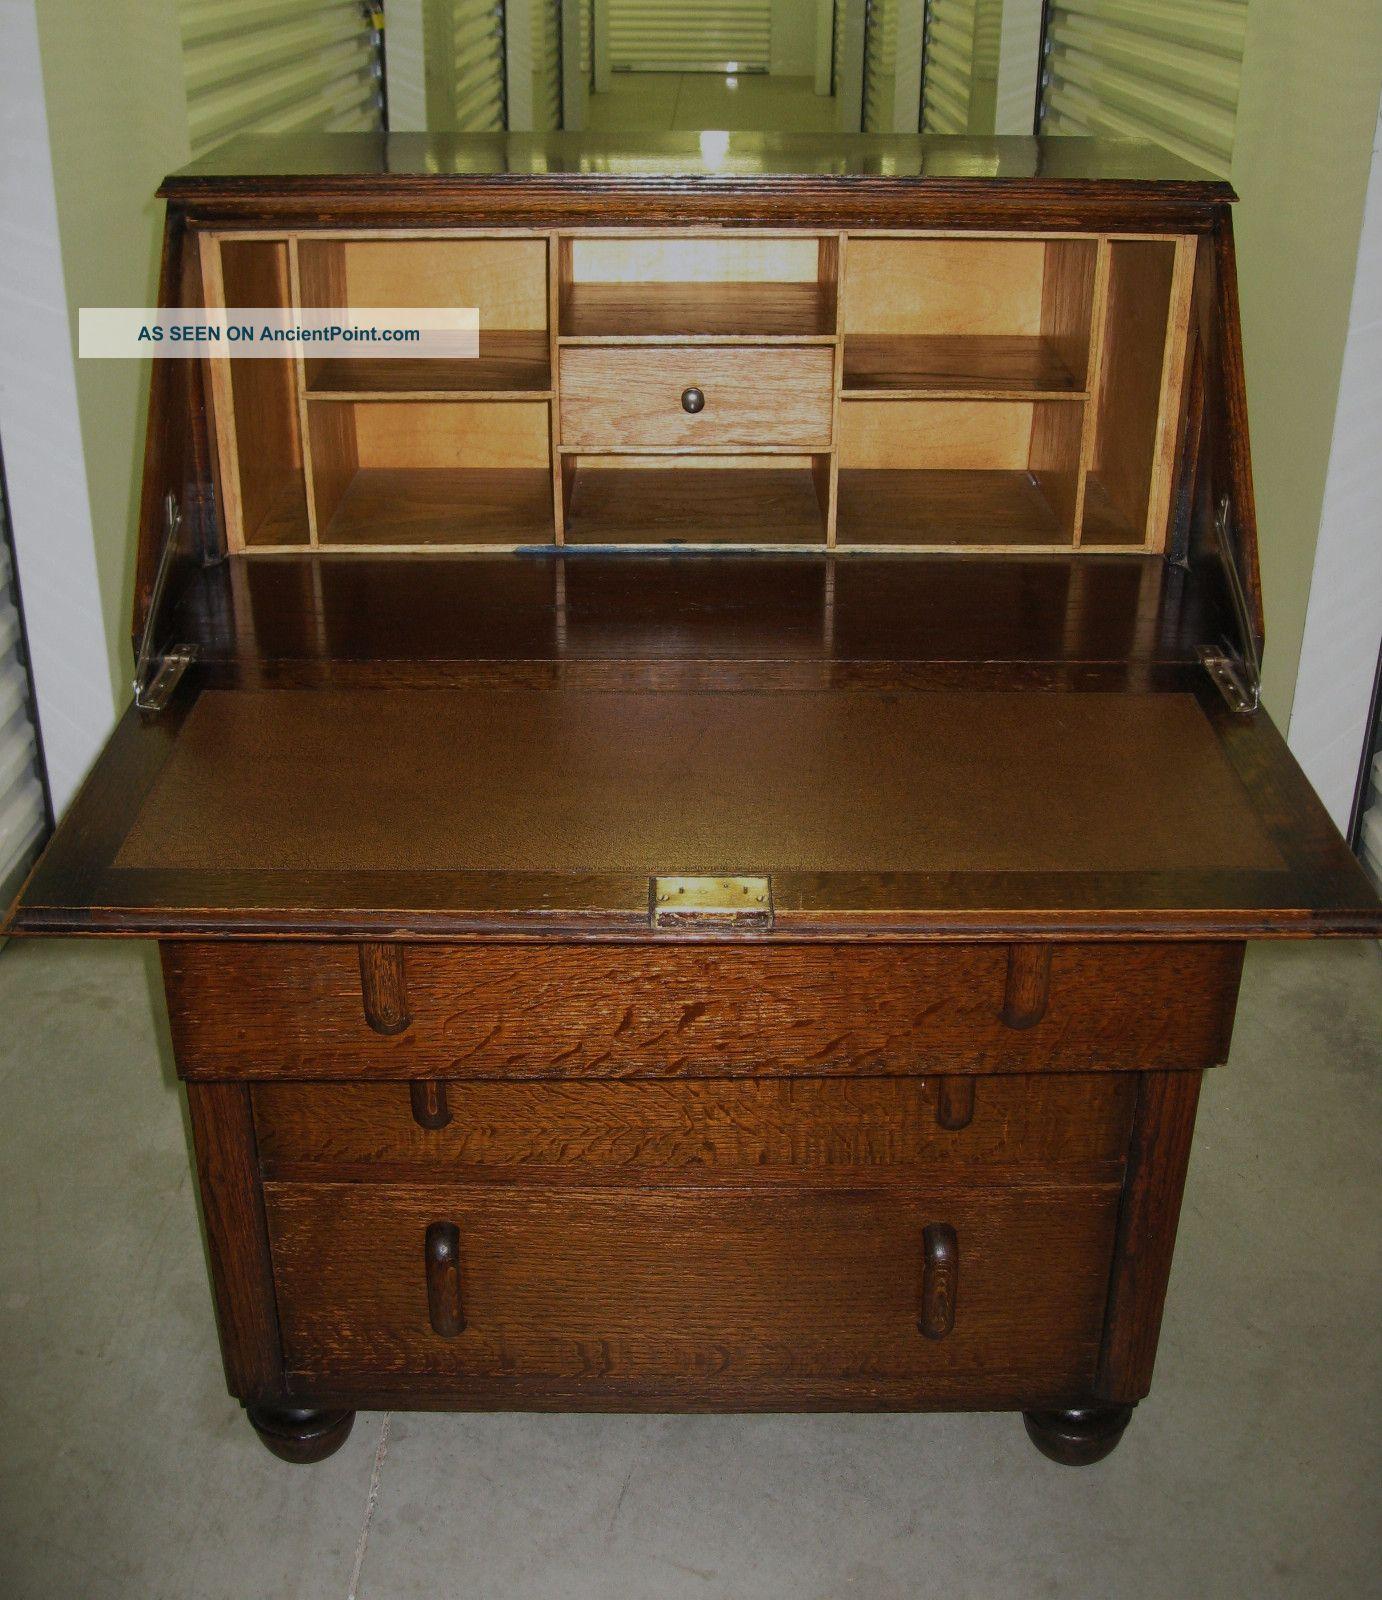 Antique Art Deco Tiger Oak Wood Secretary Bureau Drop Front Desk Cabinet 1800-1899 photo